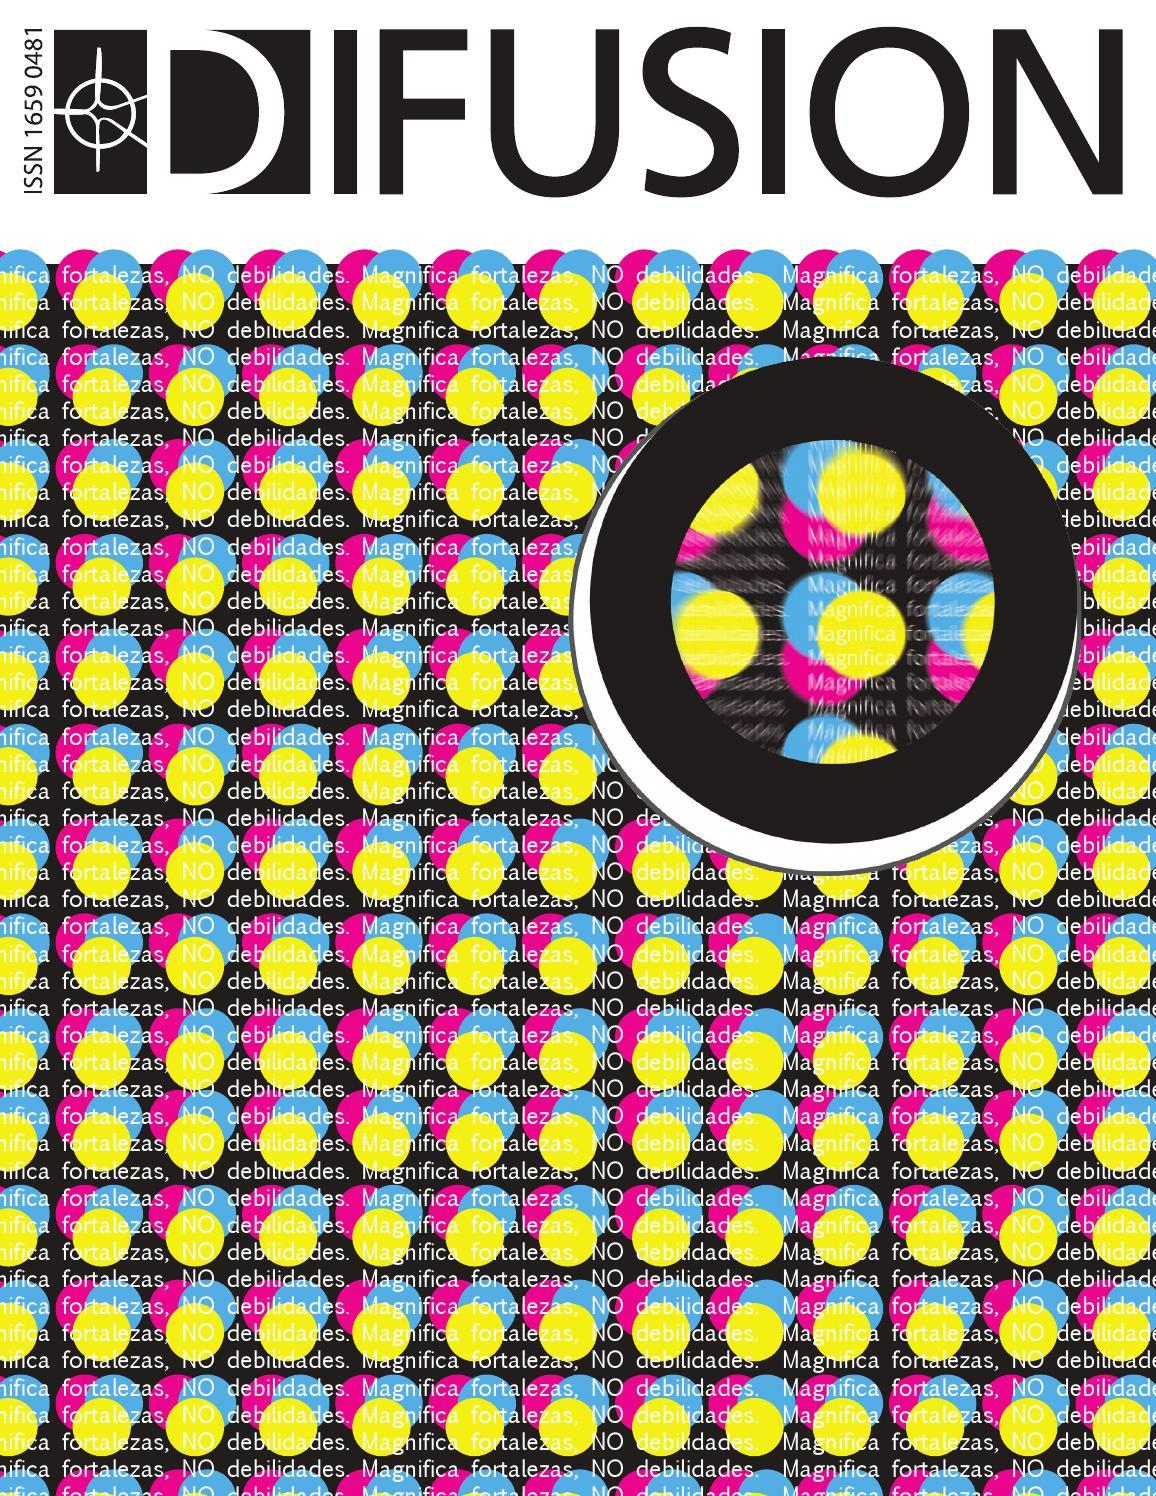 Revista Difusion By Maria Christina Connell Burke Issuu